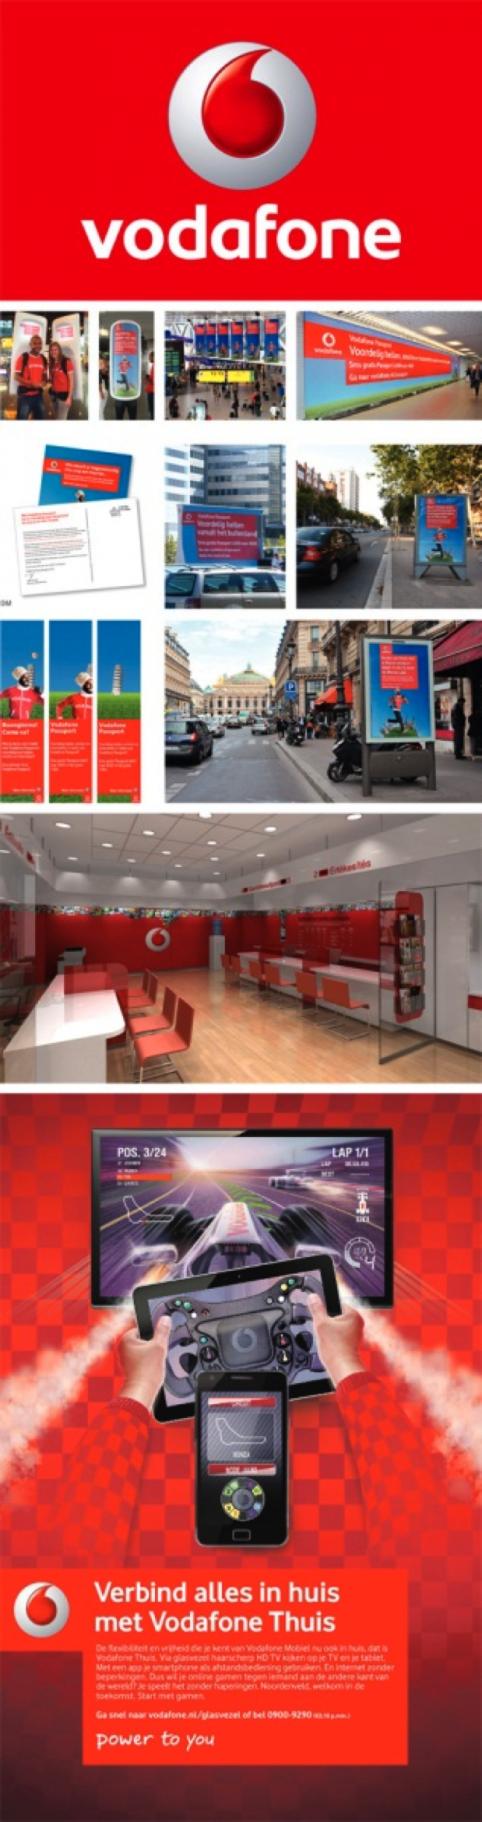 merkbeleving de kracht van kleur herkenning Vodafone